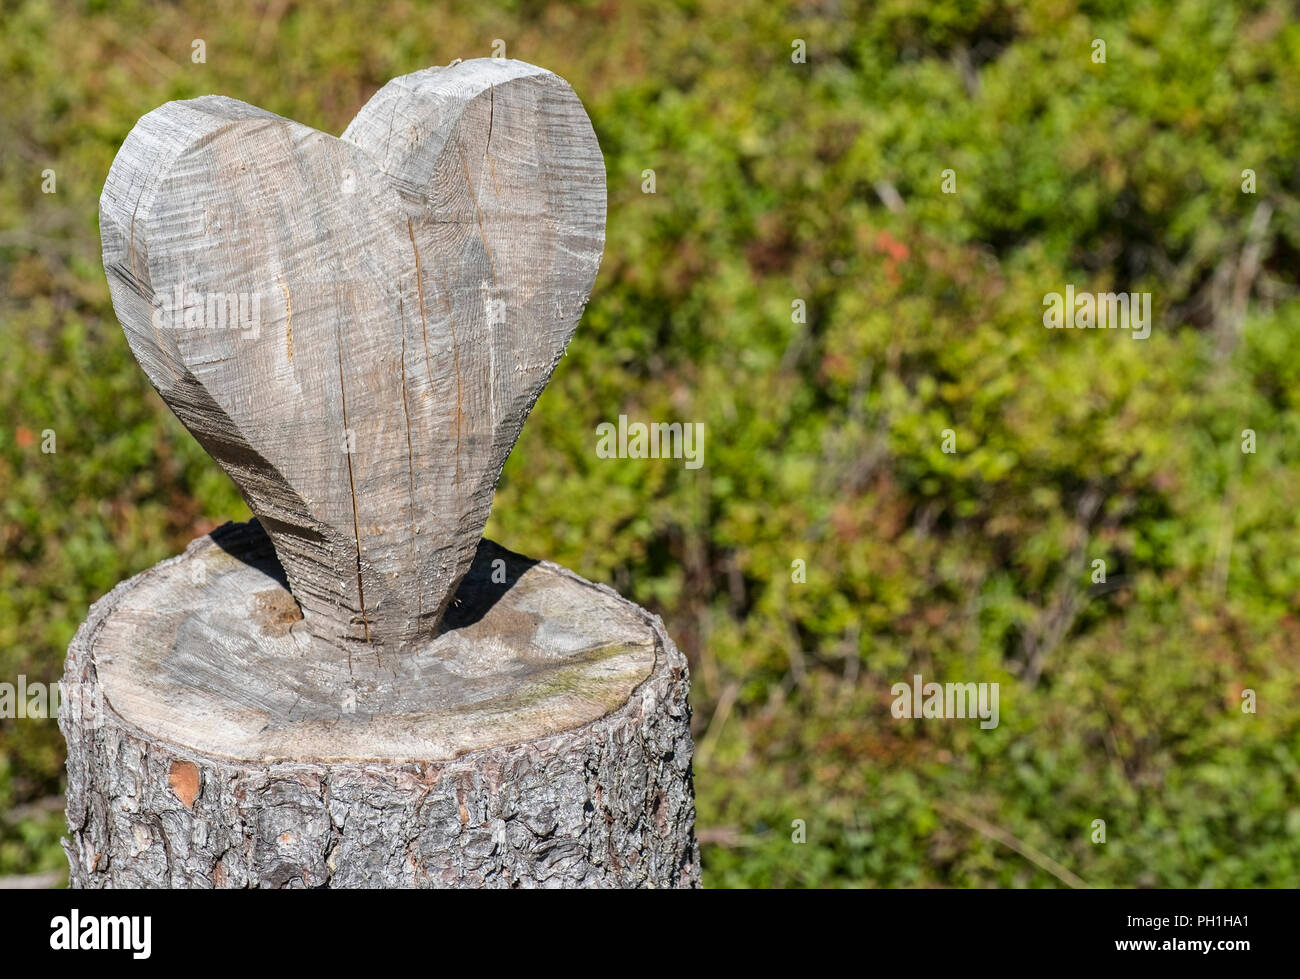 Wooden heart, Austria, Europe - Stock Image